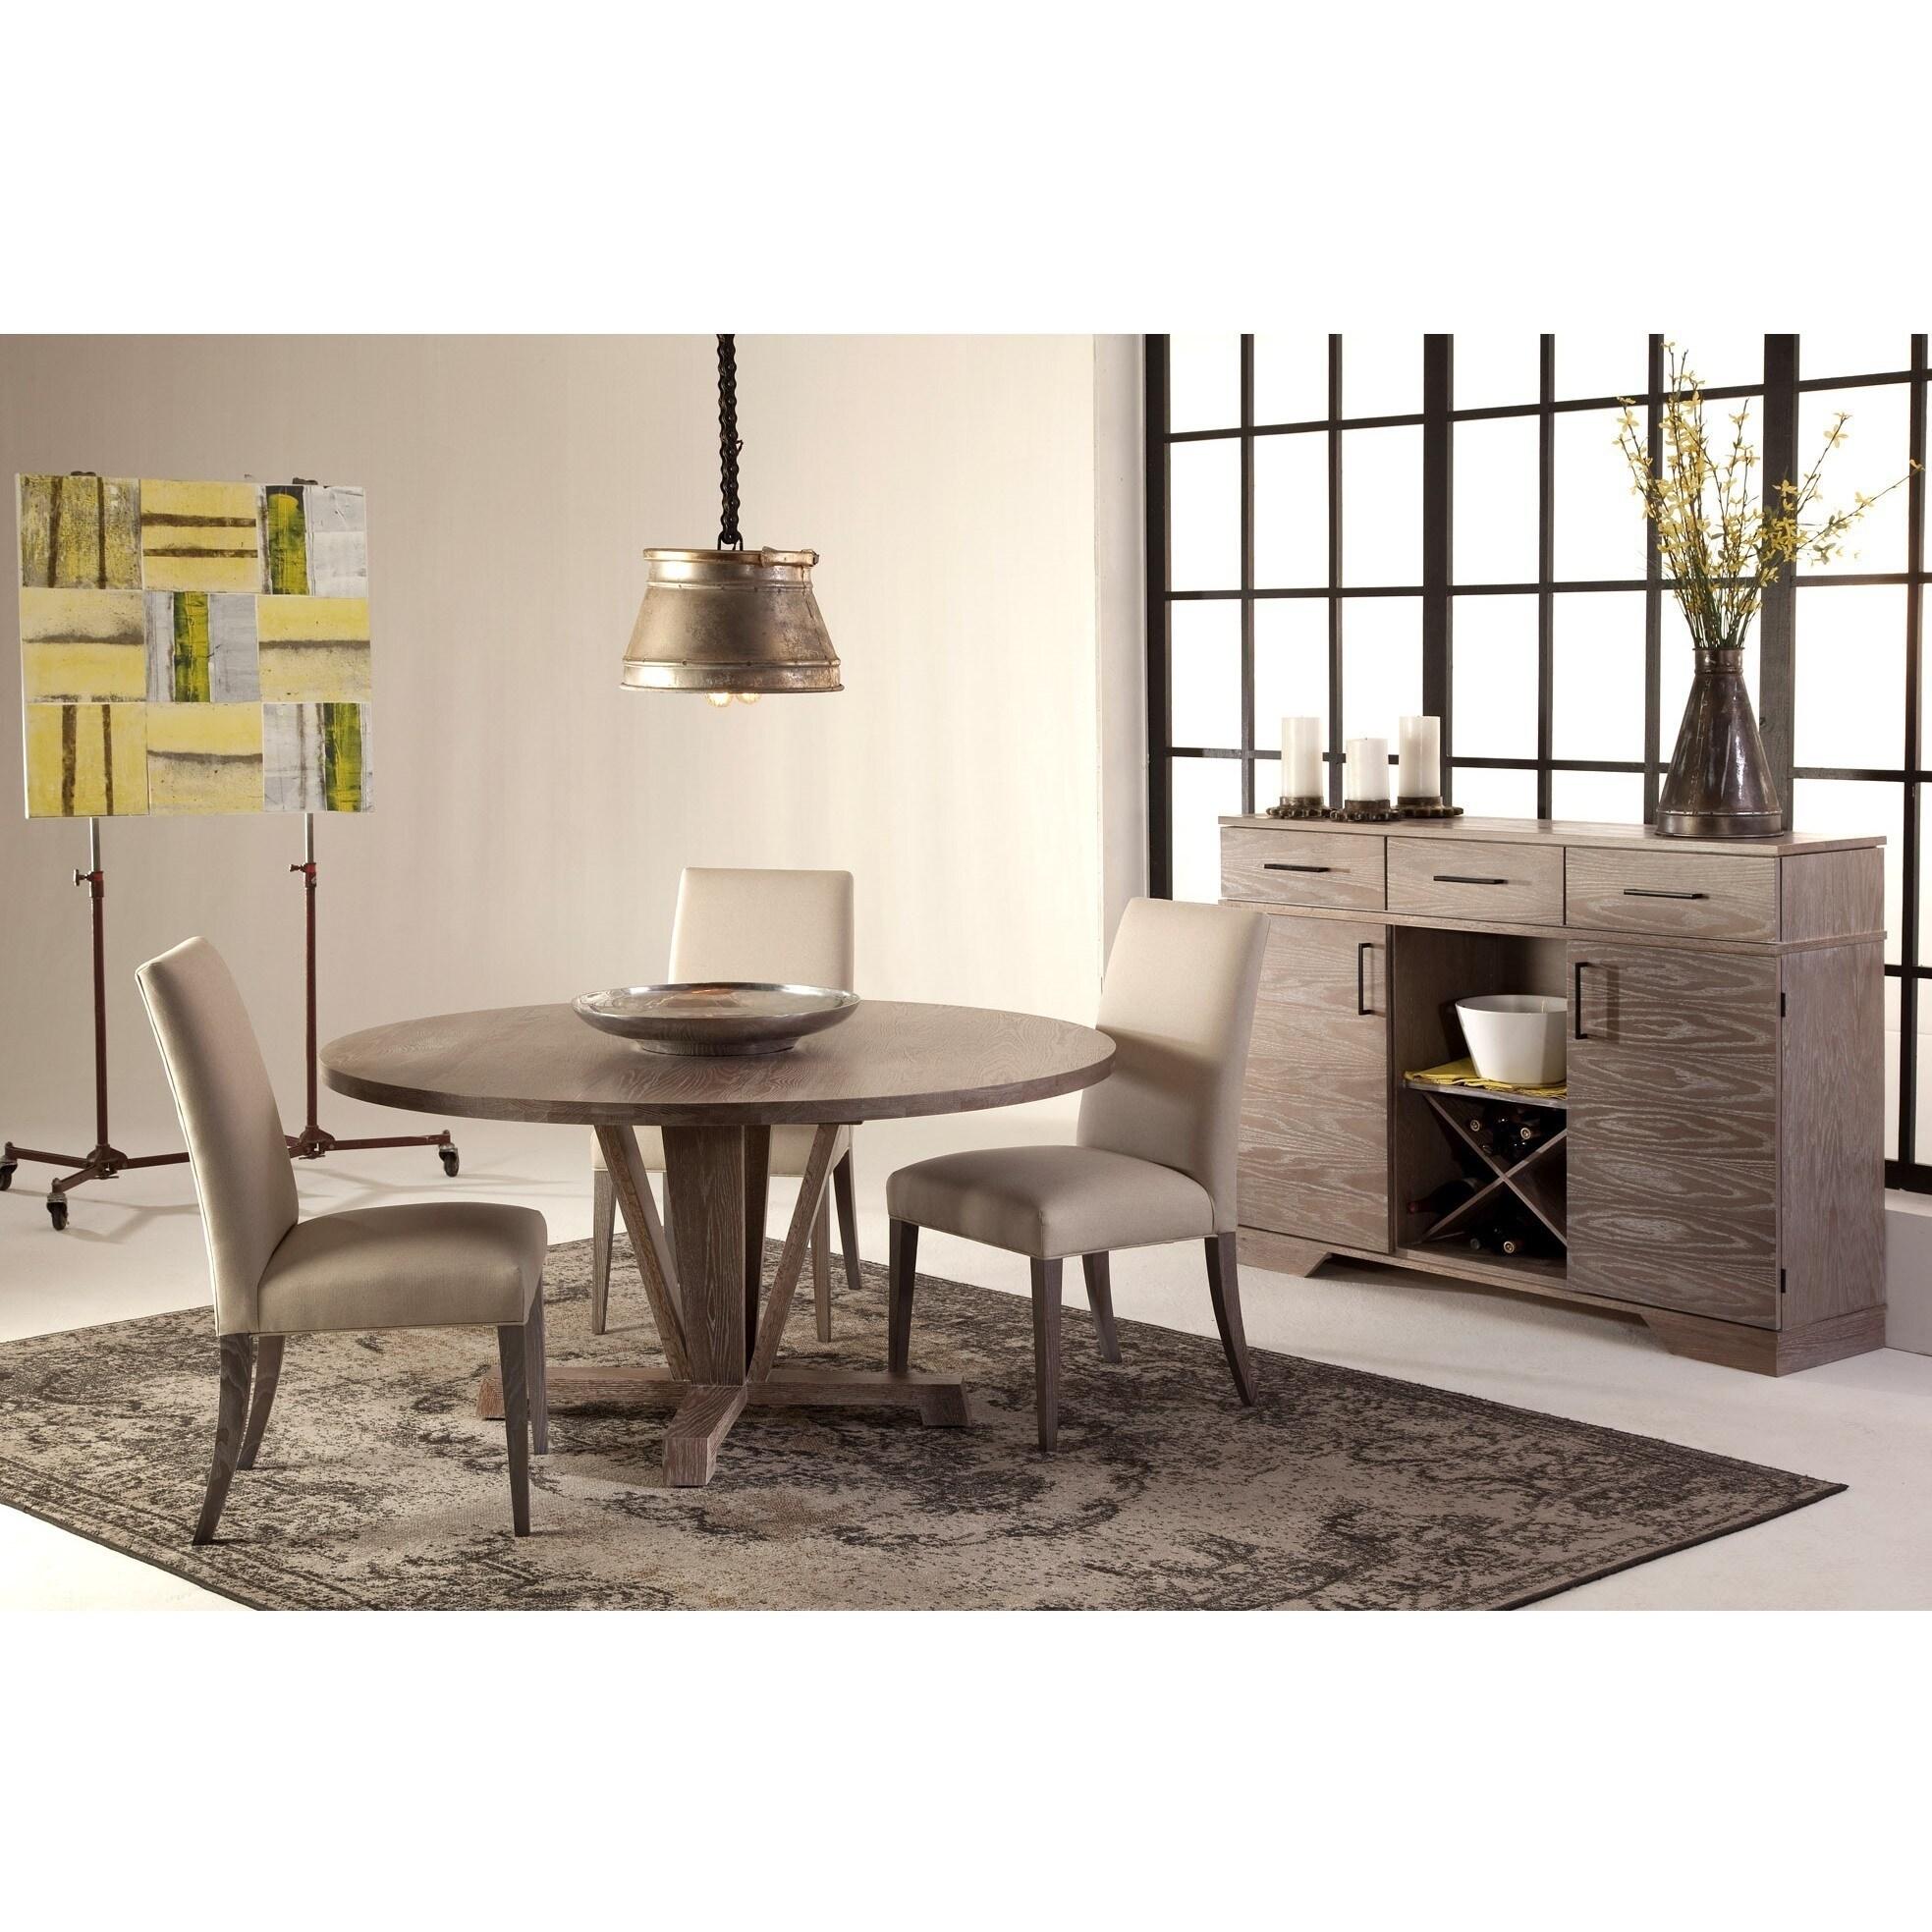 Saloom Boylston 54 Inch Round Cafe Oak Custom Dining Table Free Shipping Today 11518166